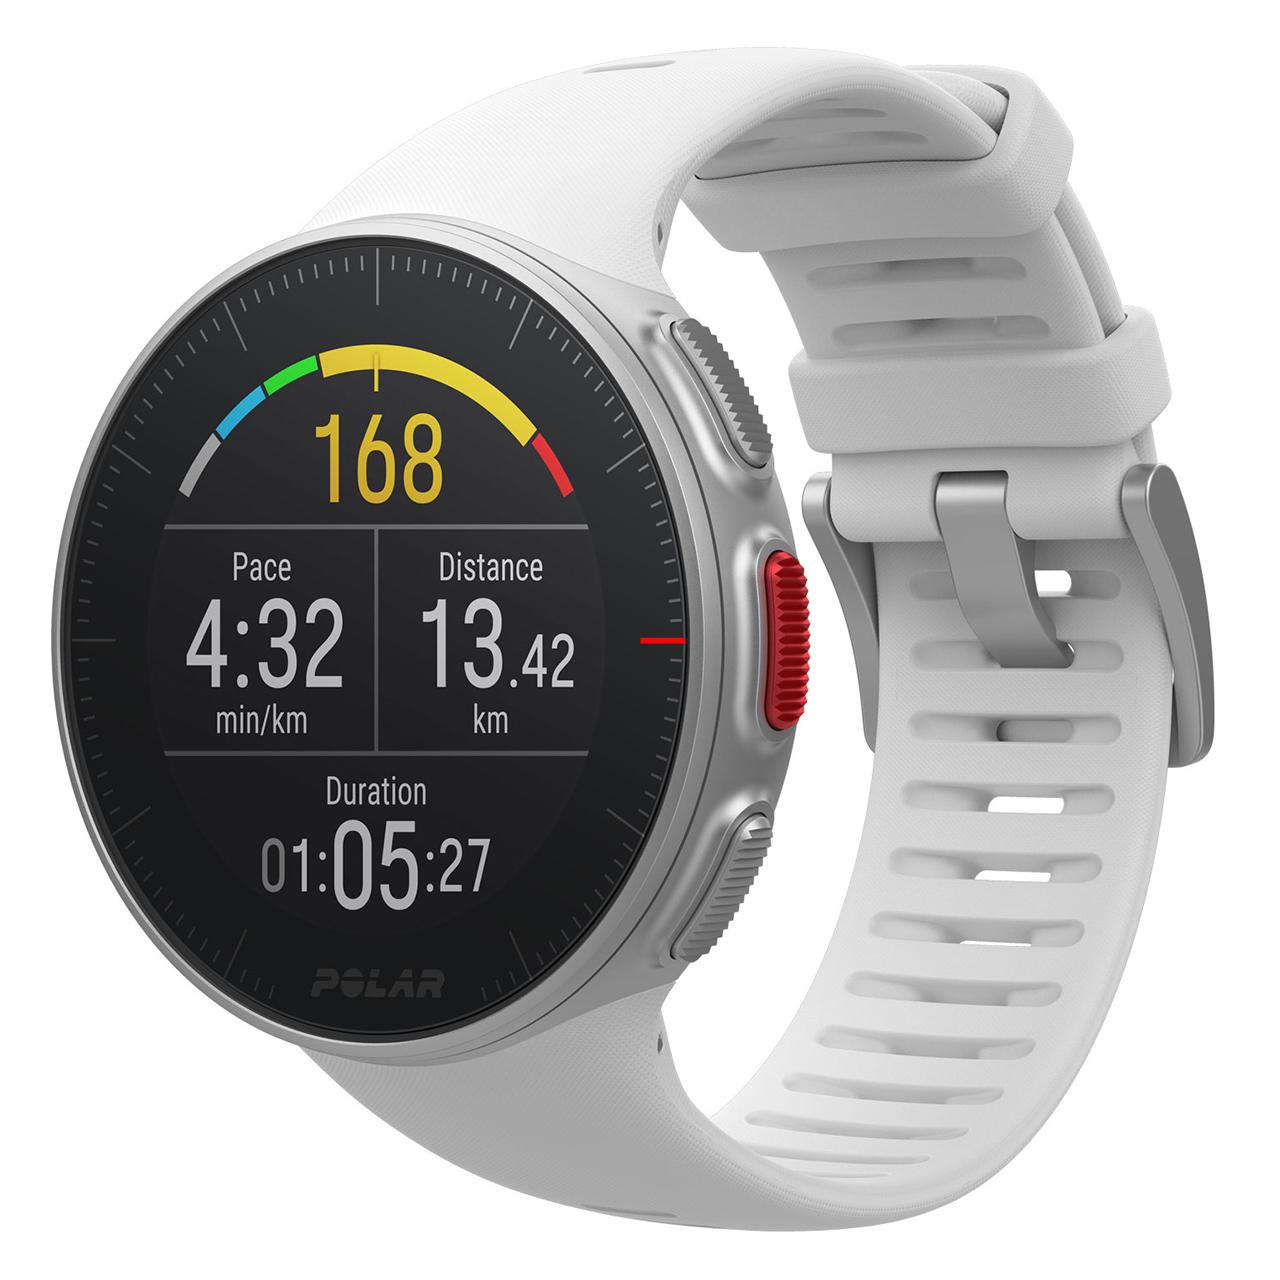 ساعت  هوشمند پلار مدل VANTAGE V